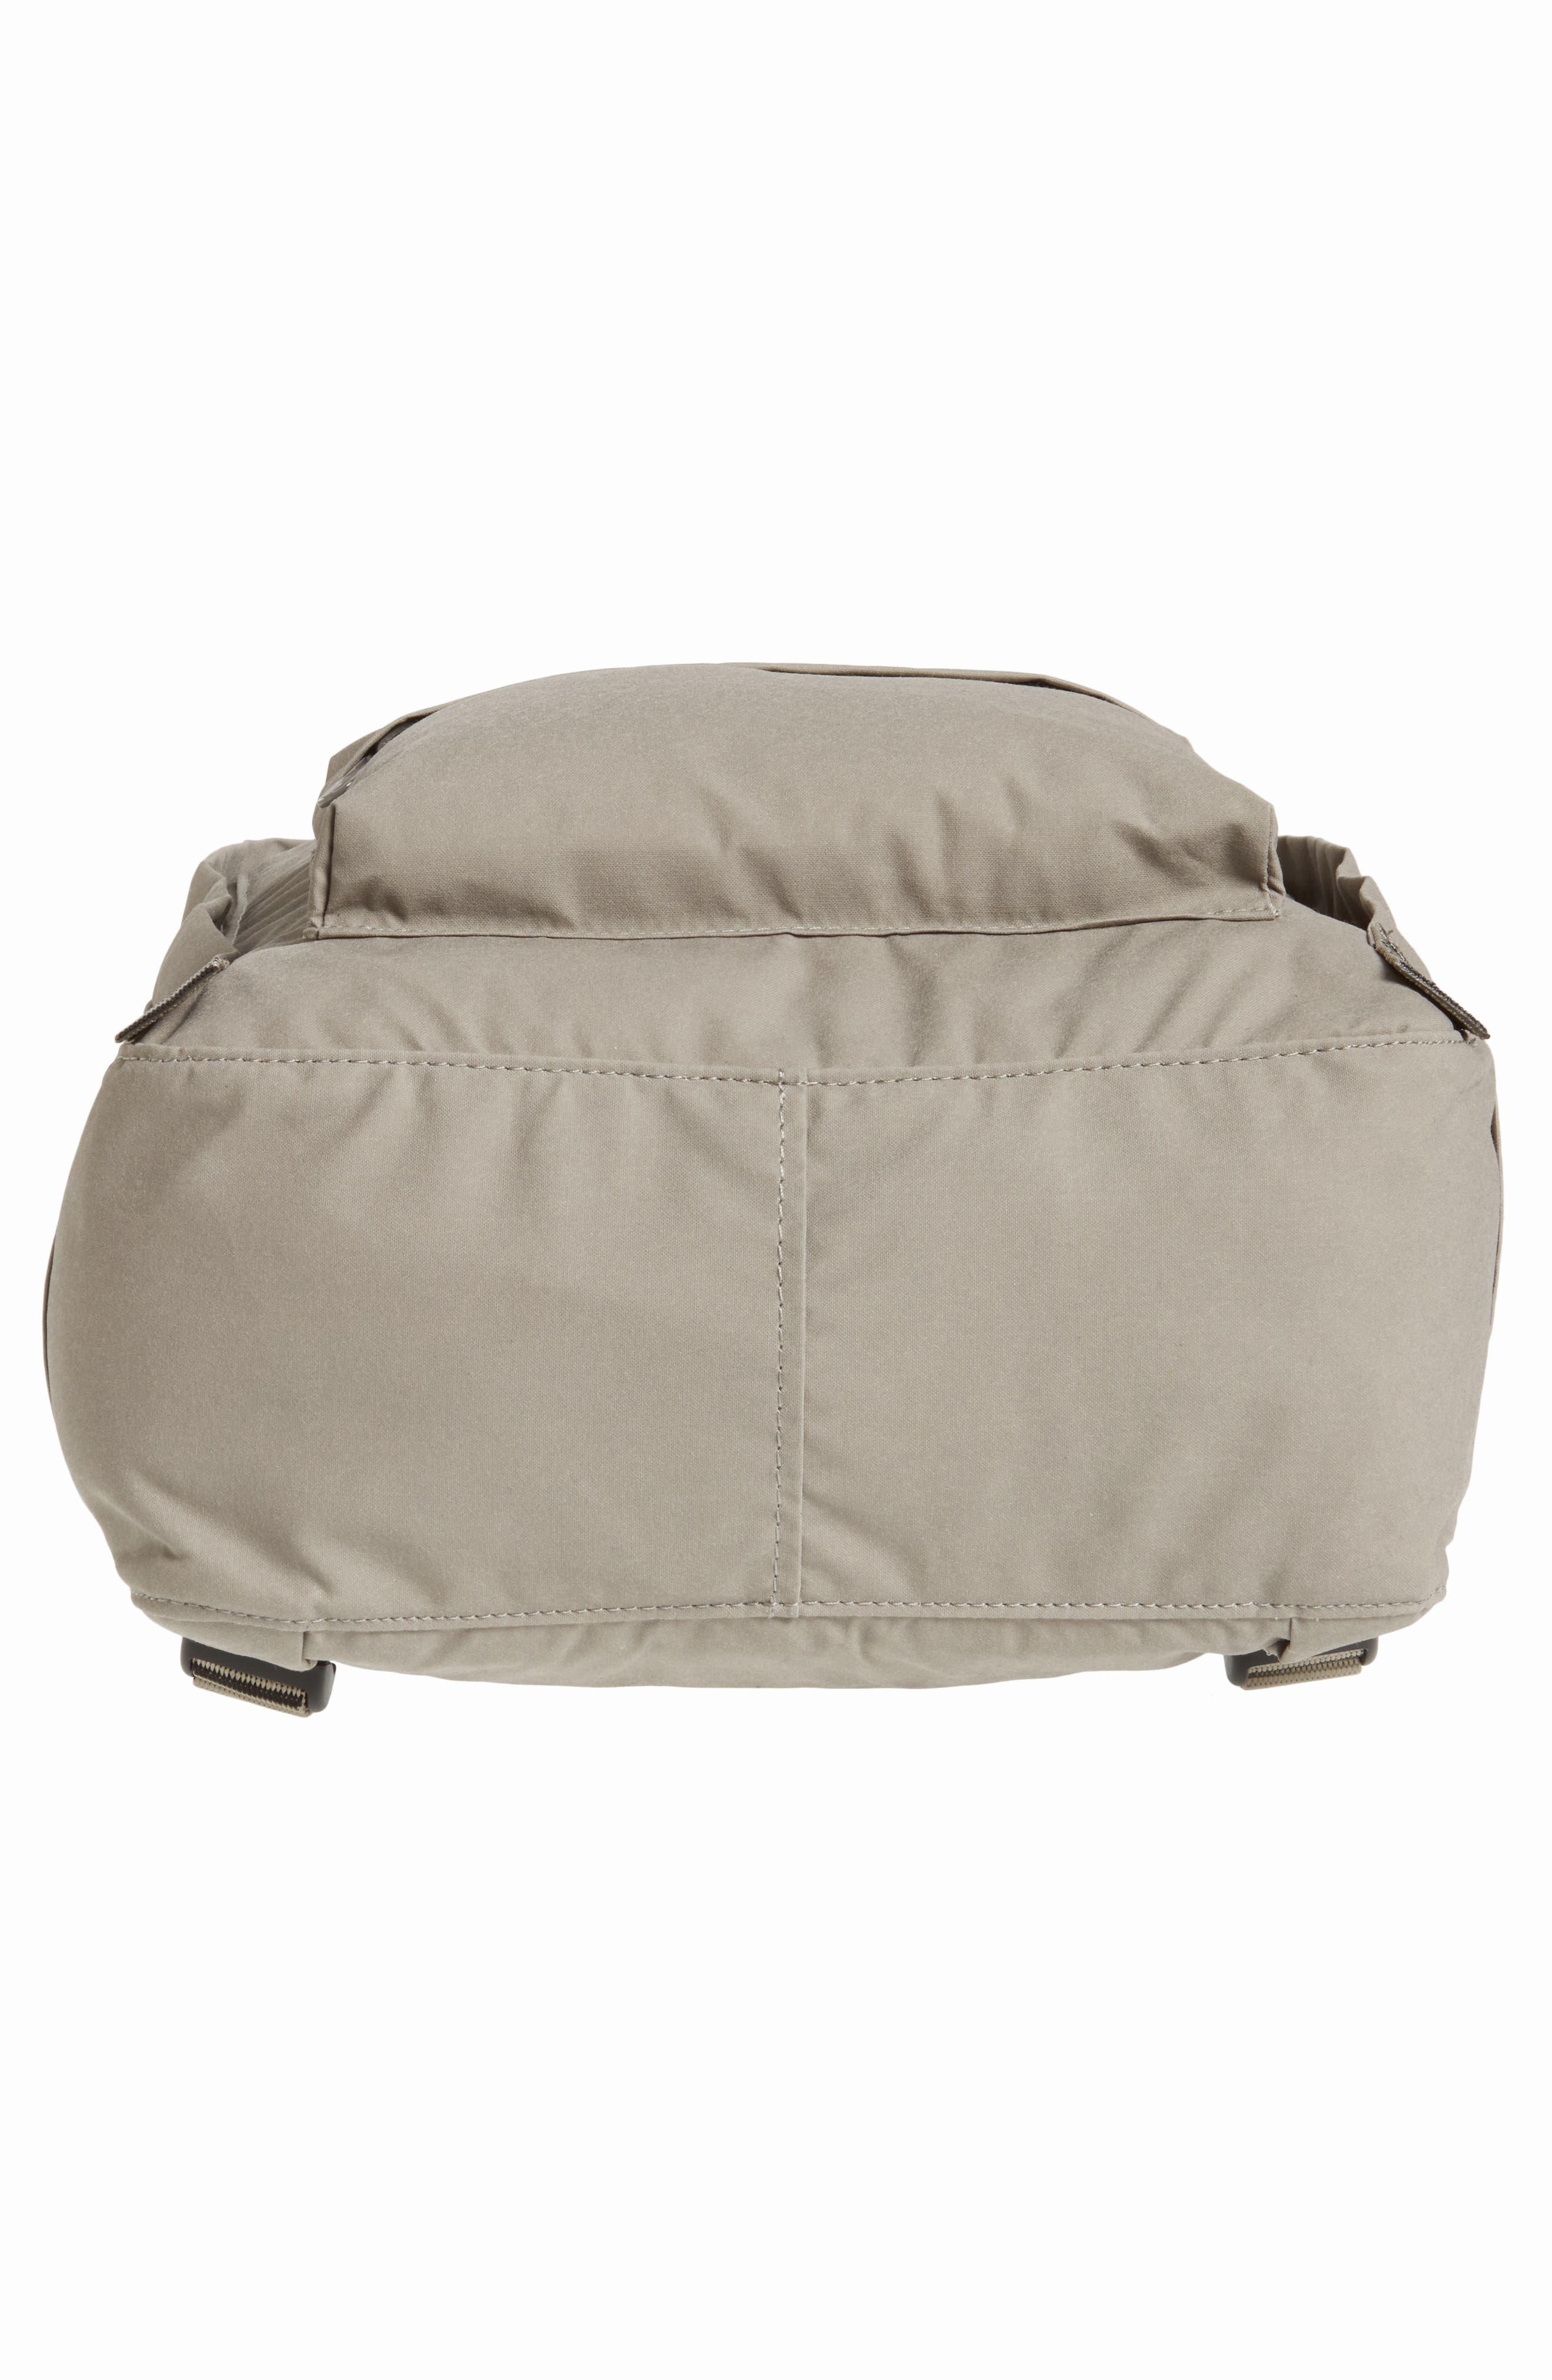 'Kånken' Water Resistant Backpack,                             Alternate thumbnail 303, color,